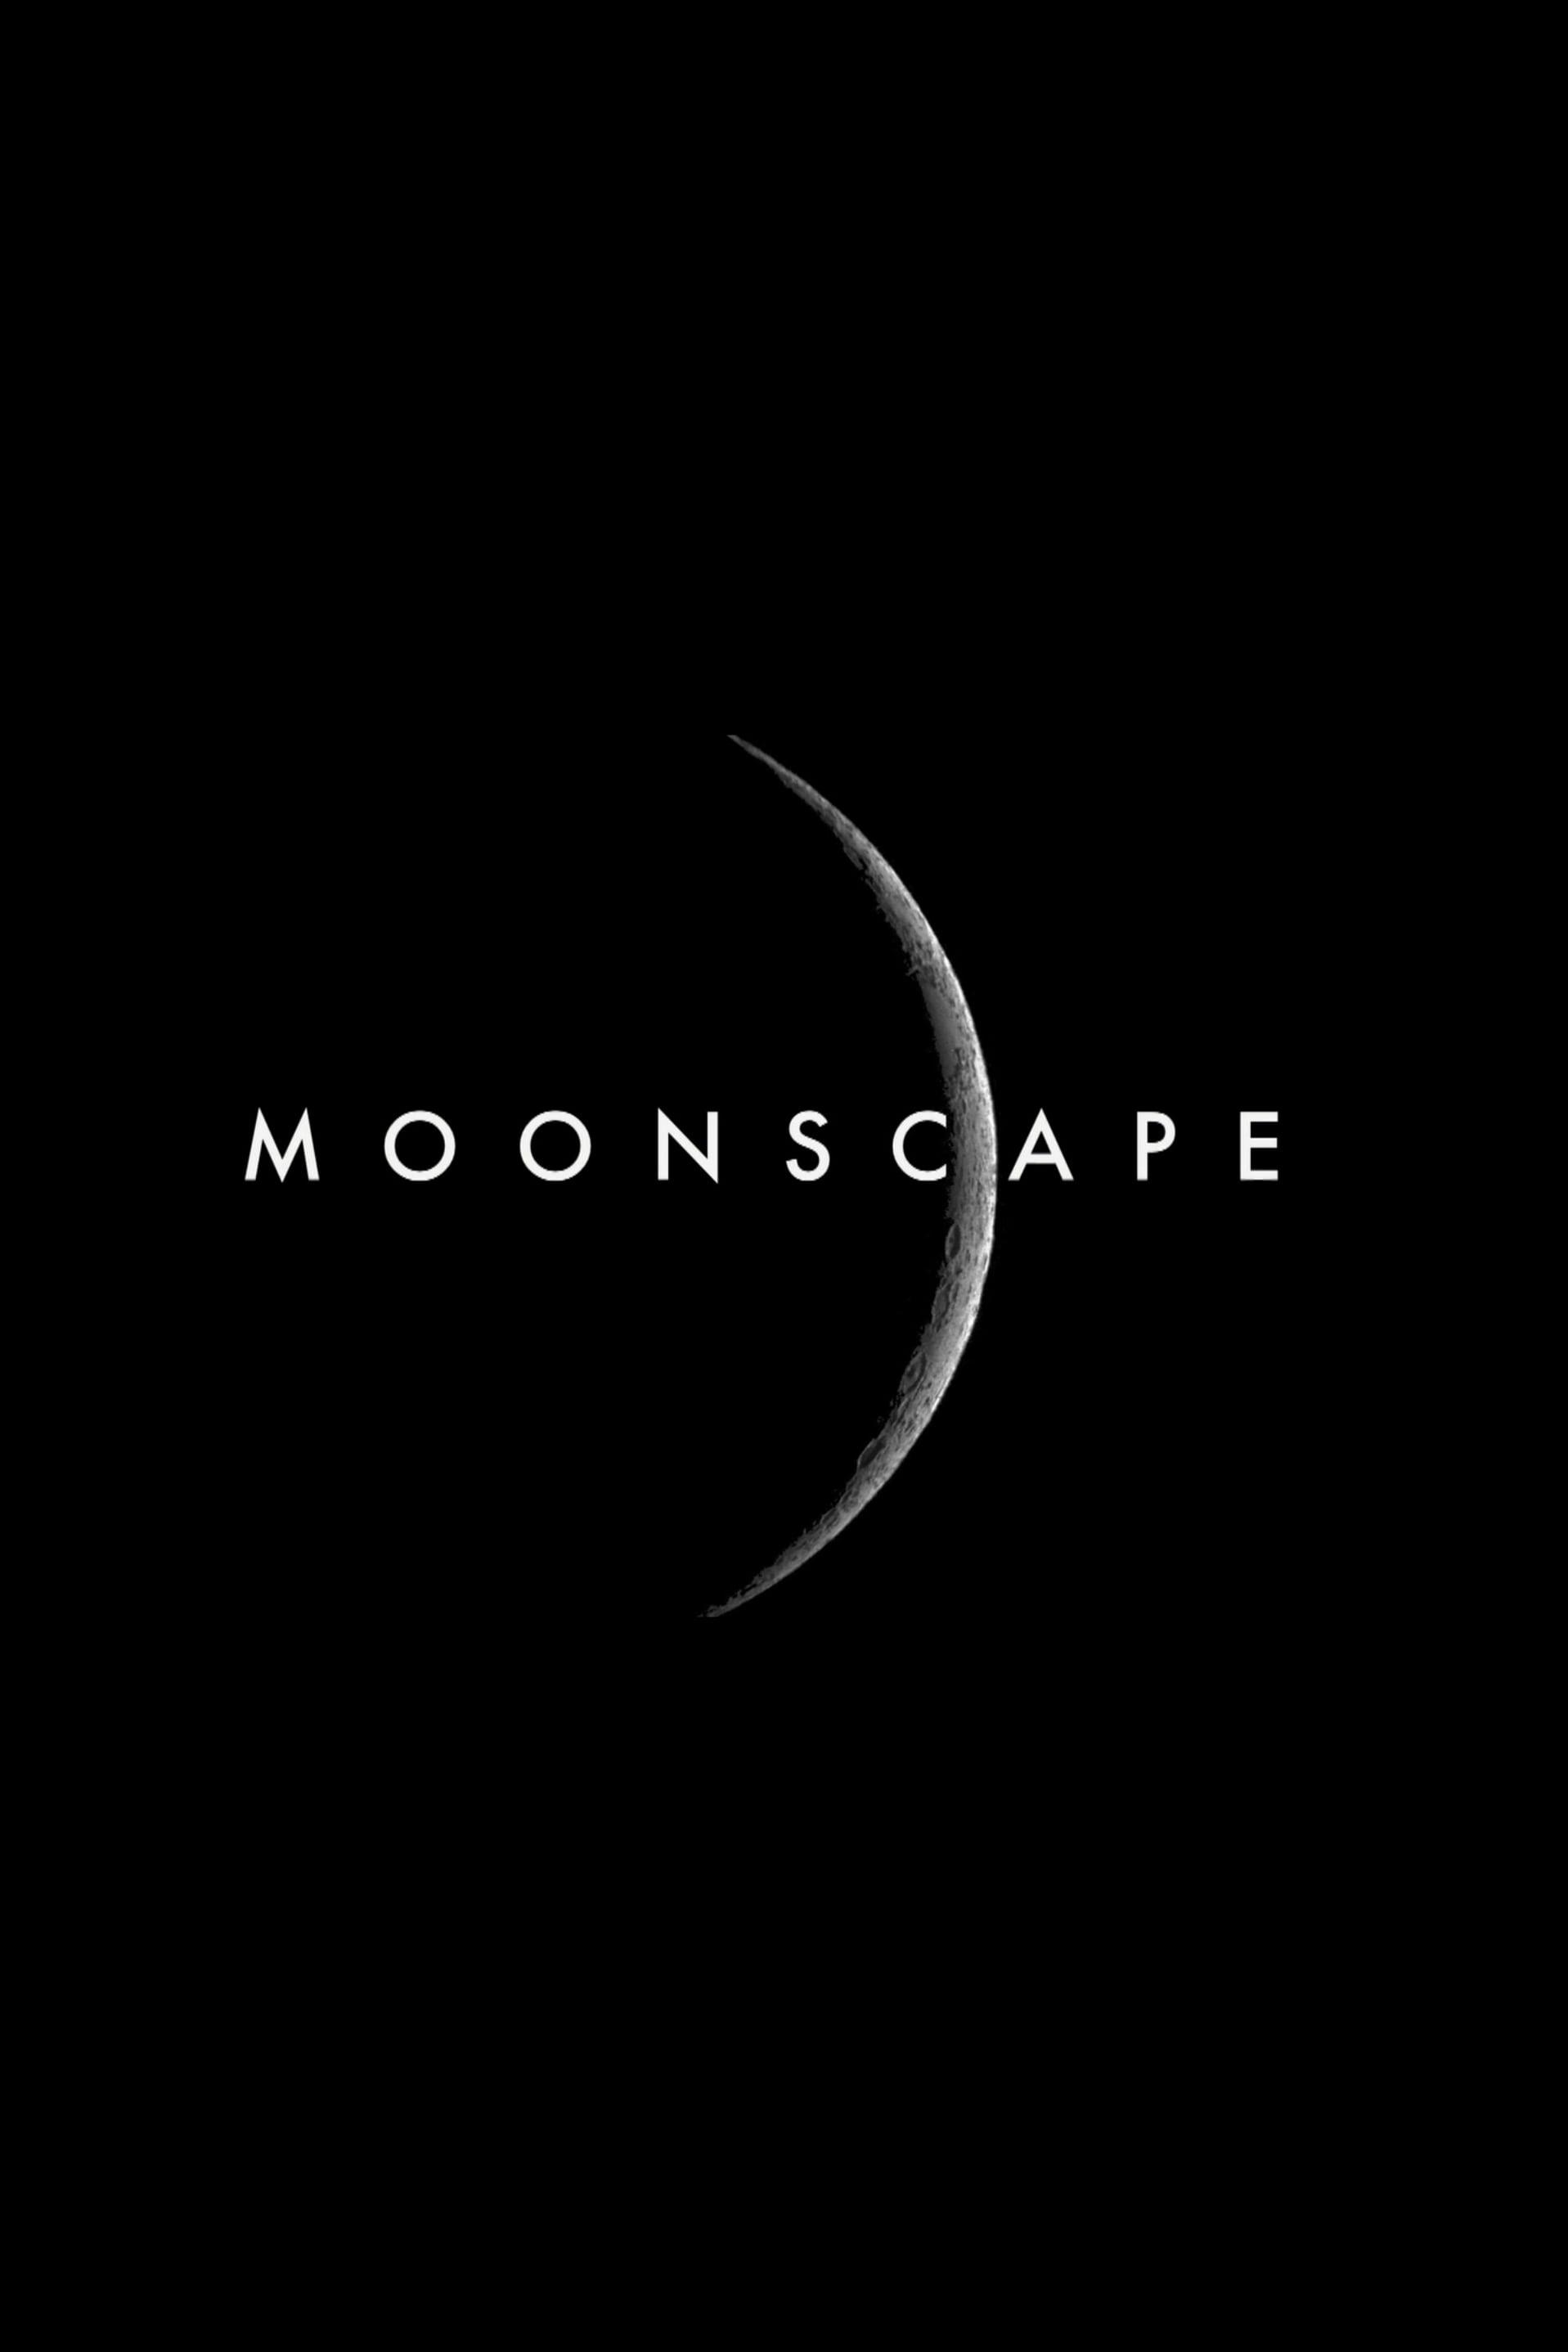 Moonscape (2013)